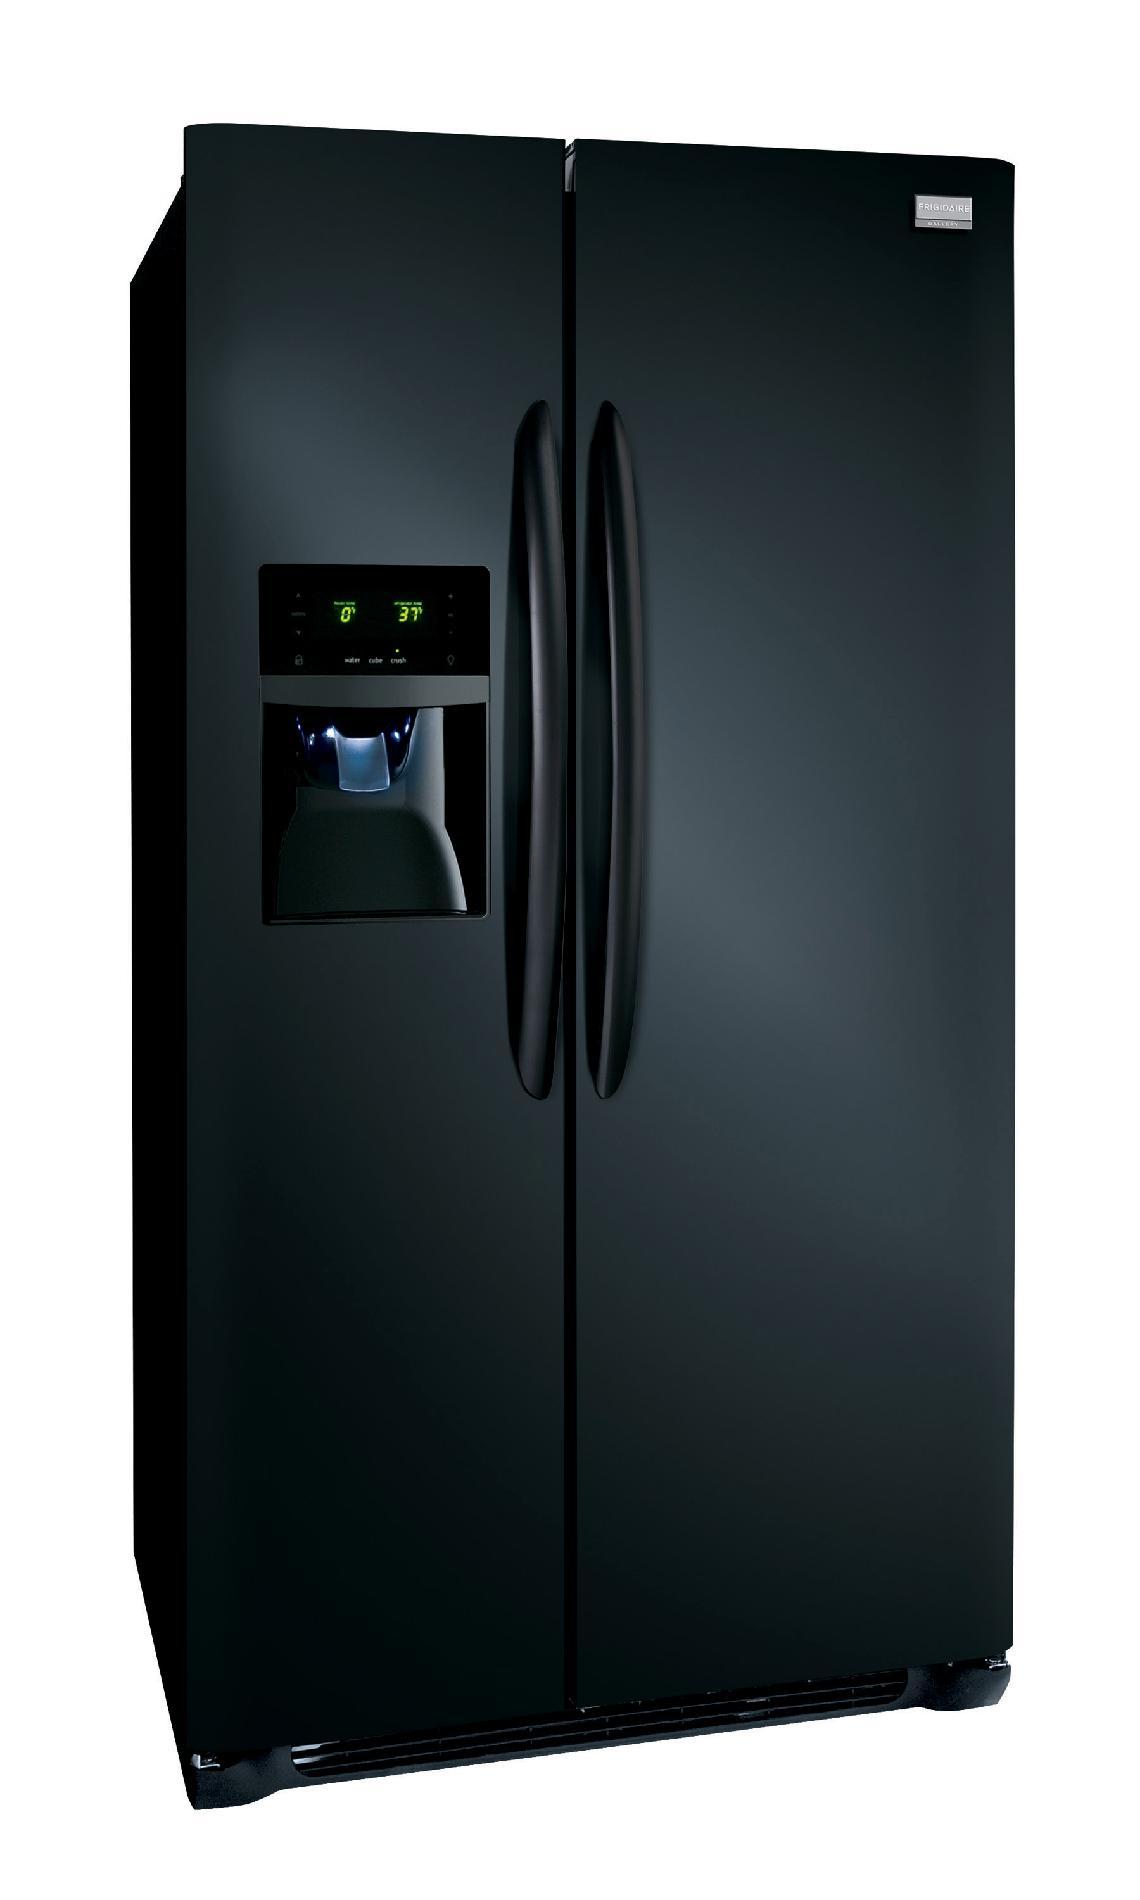 Frigidaire Gallery FGHS2631PE 25.6 cu. ft. Gallery Side-by-Side Refrigerator - Black